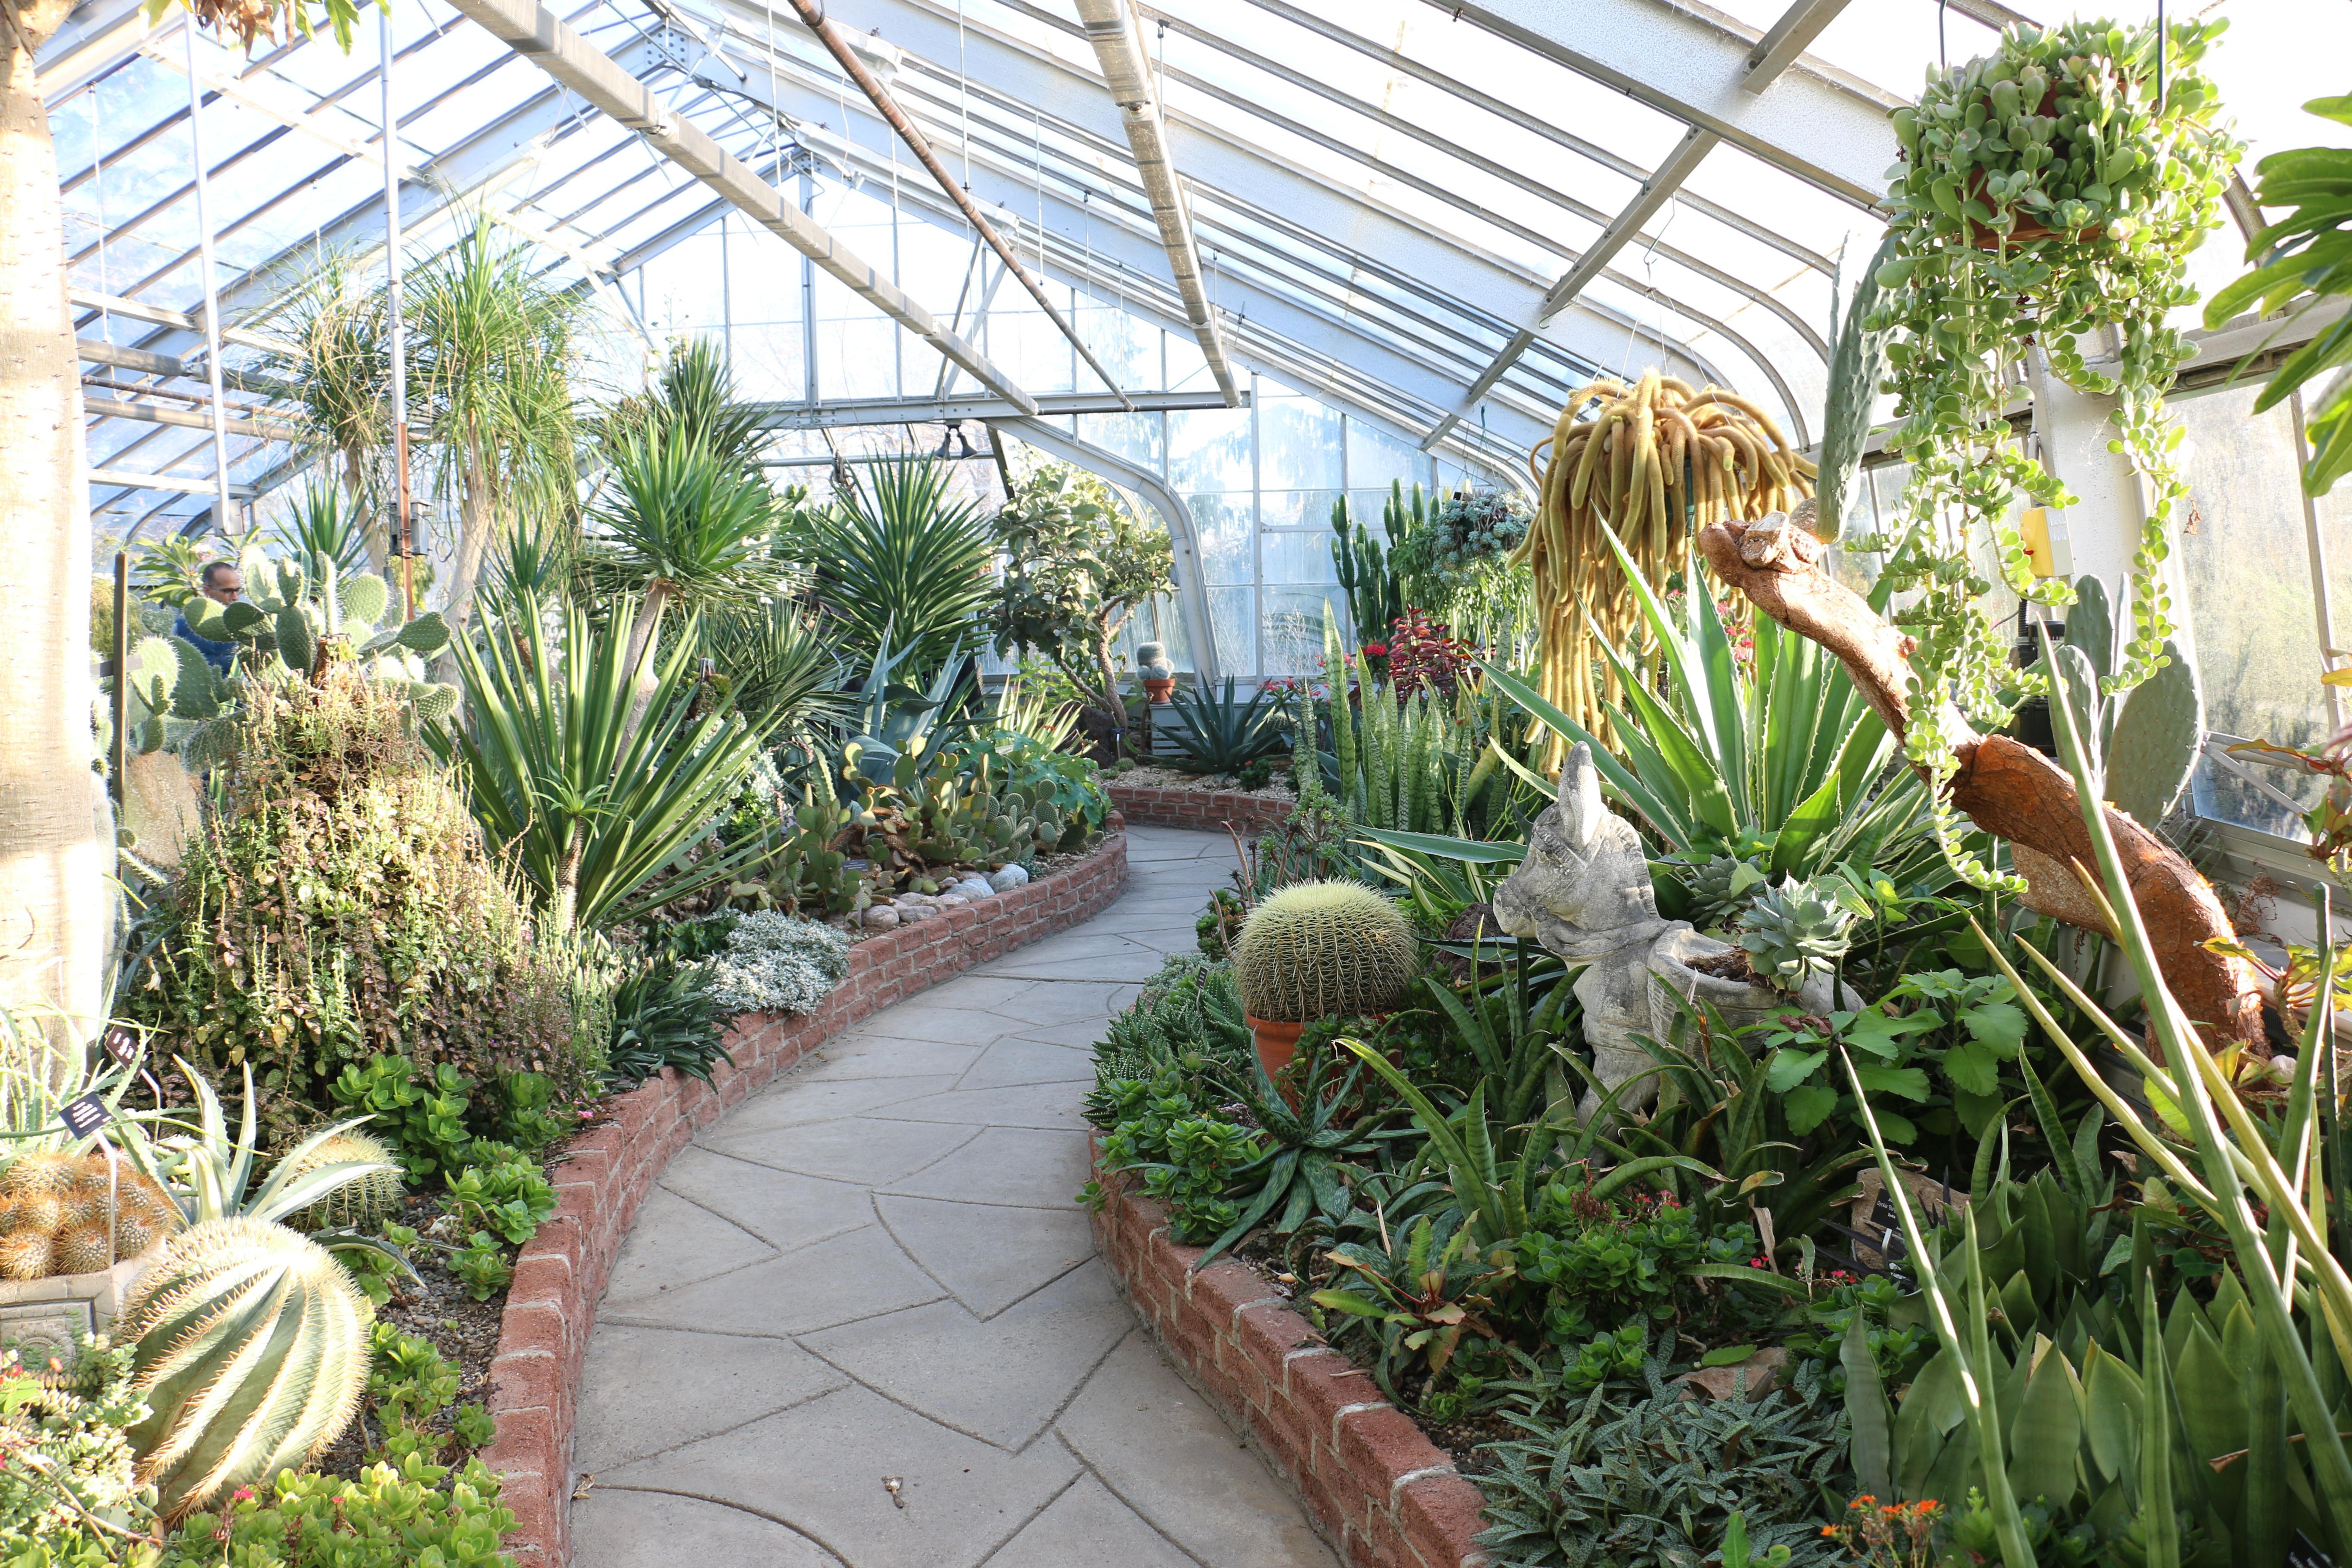 a-trip-to-the-centennial-park-conservatory